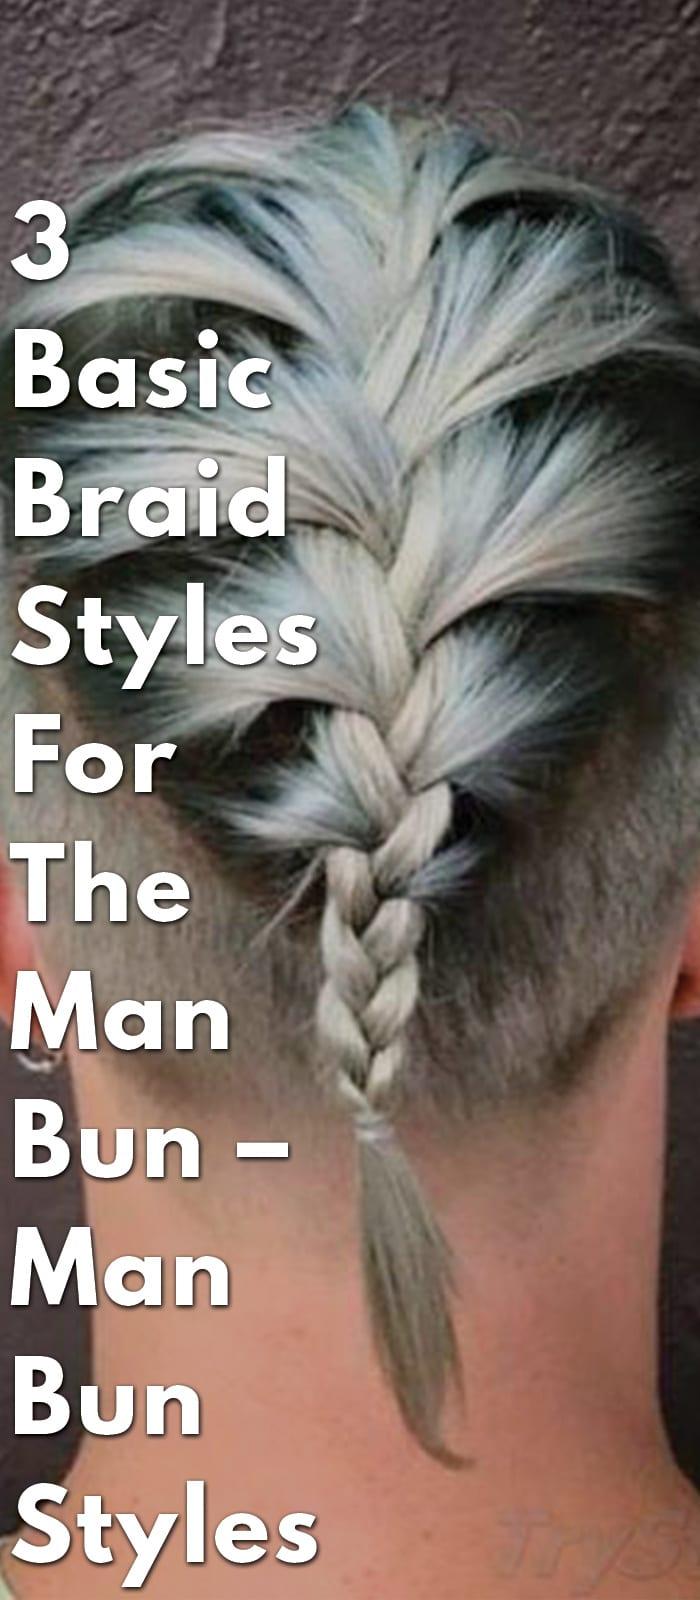 3-Basic-Braid-Styles-For-The-Man-Bun-–-Man-Bun-Styles